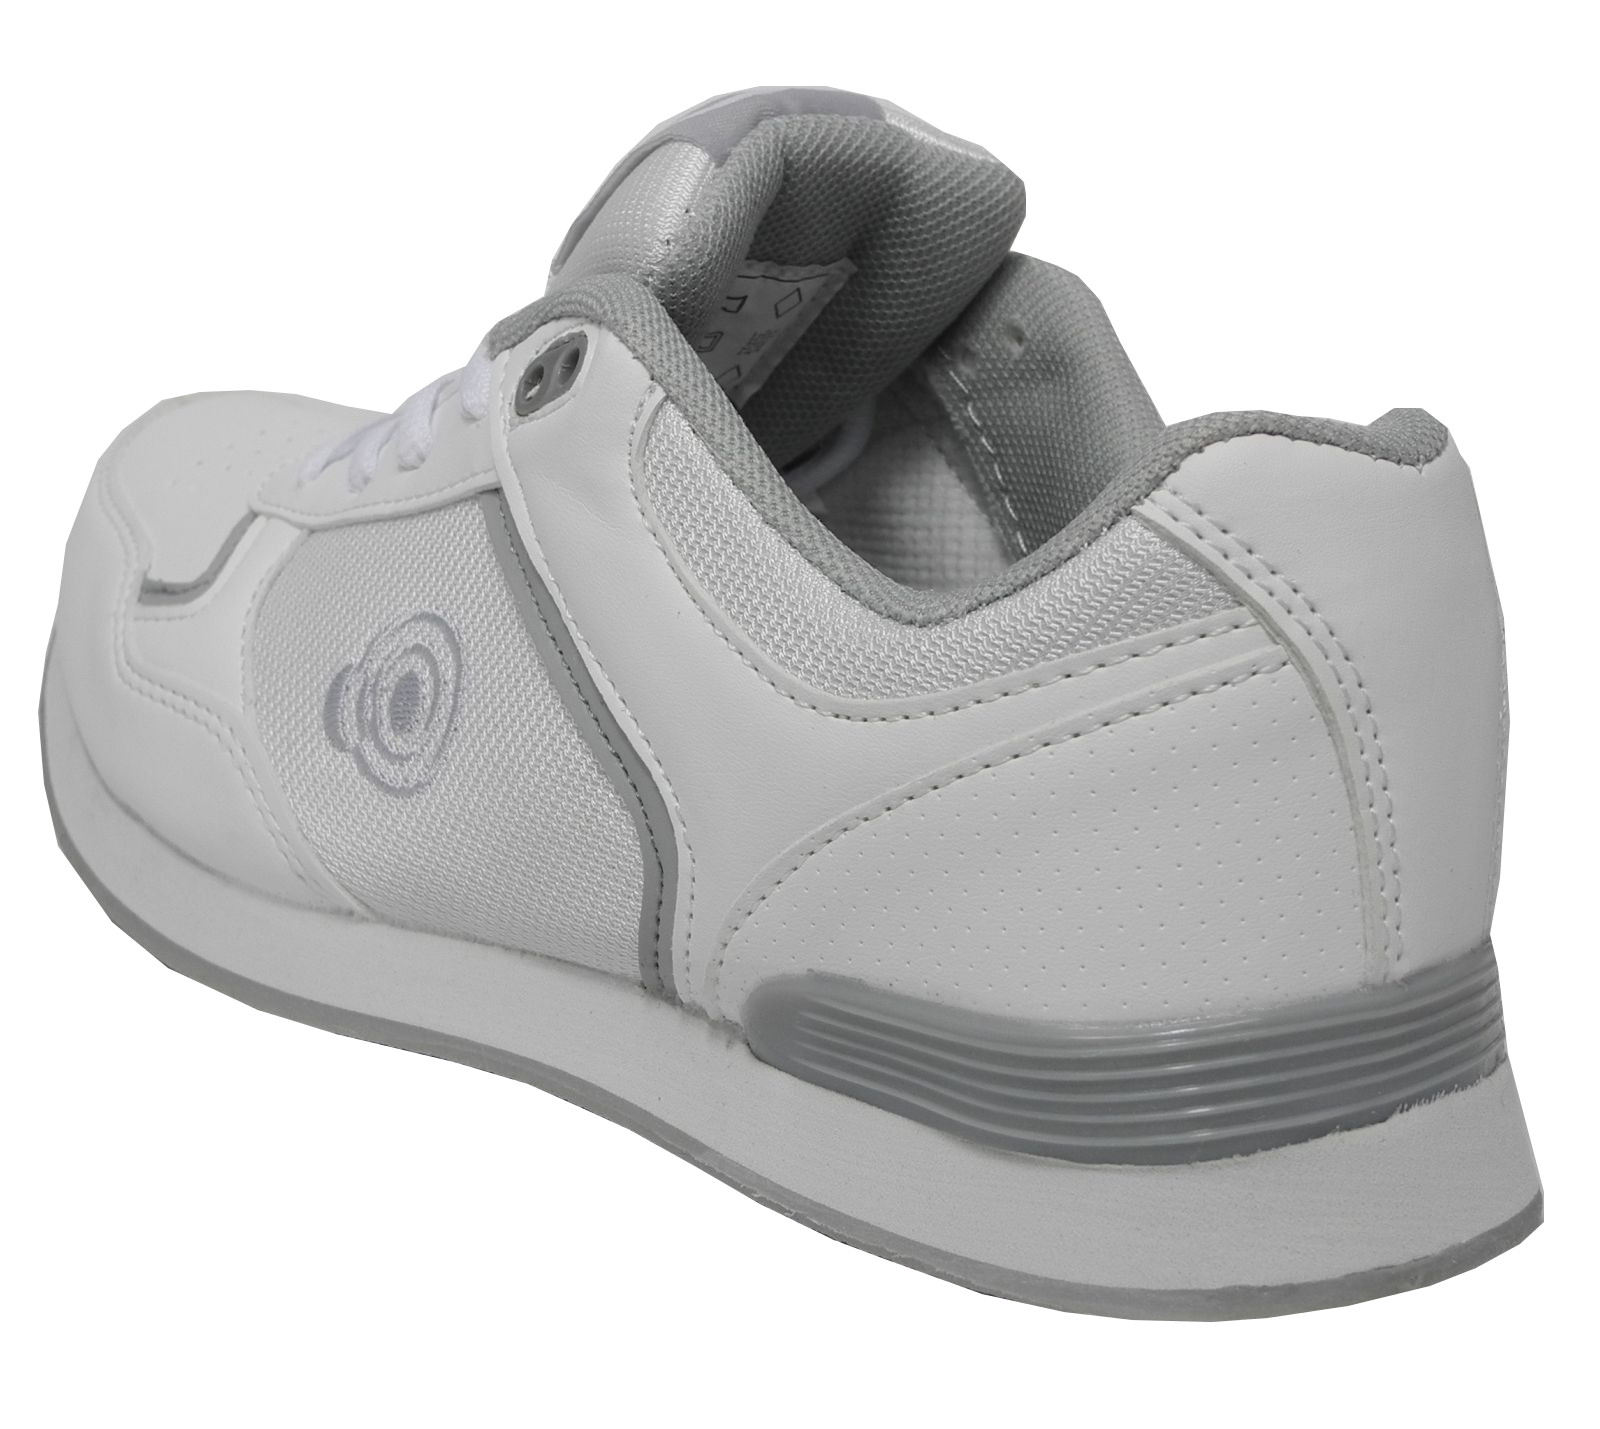 White Bowls Shoes Mens